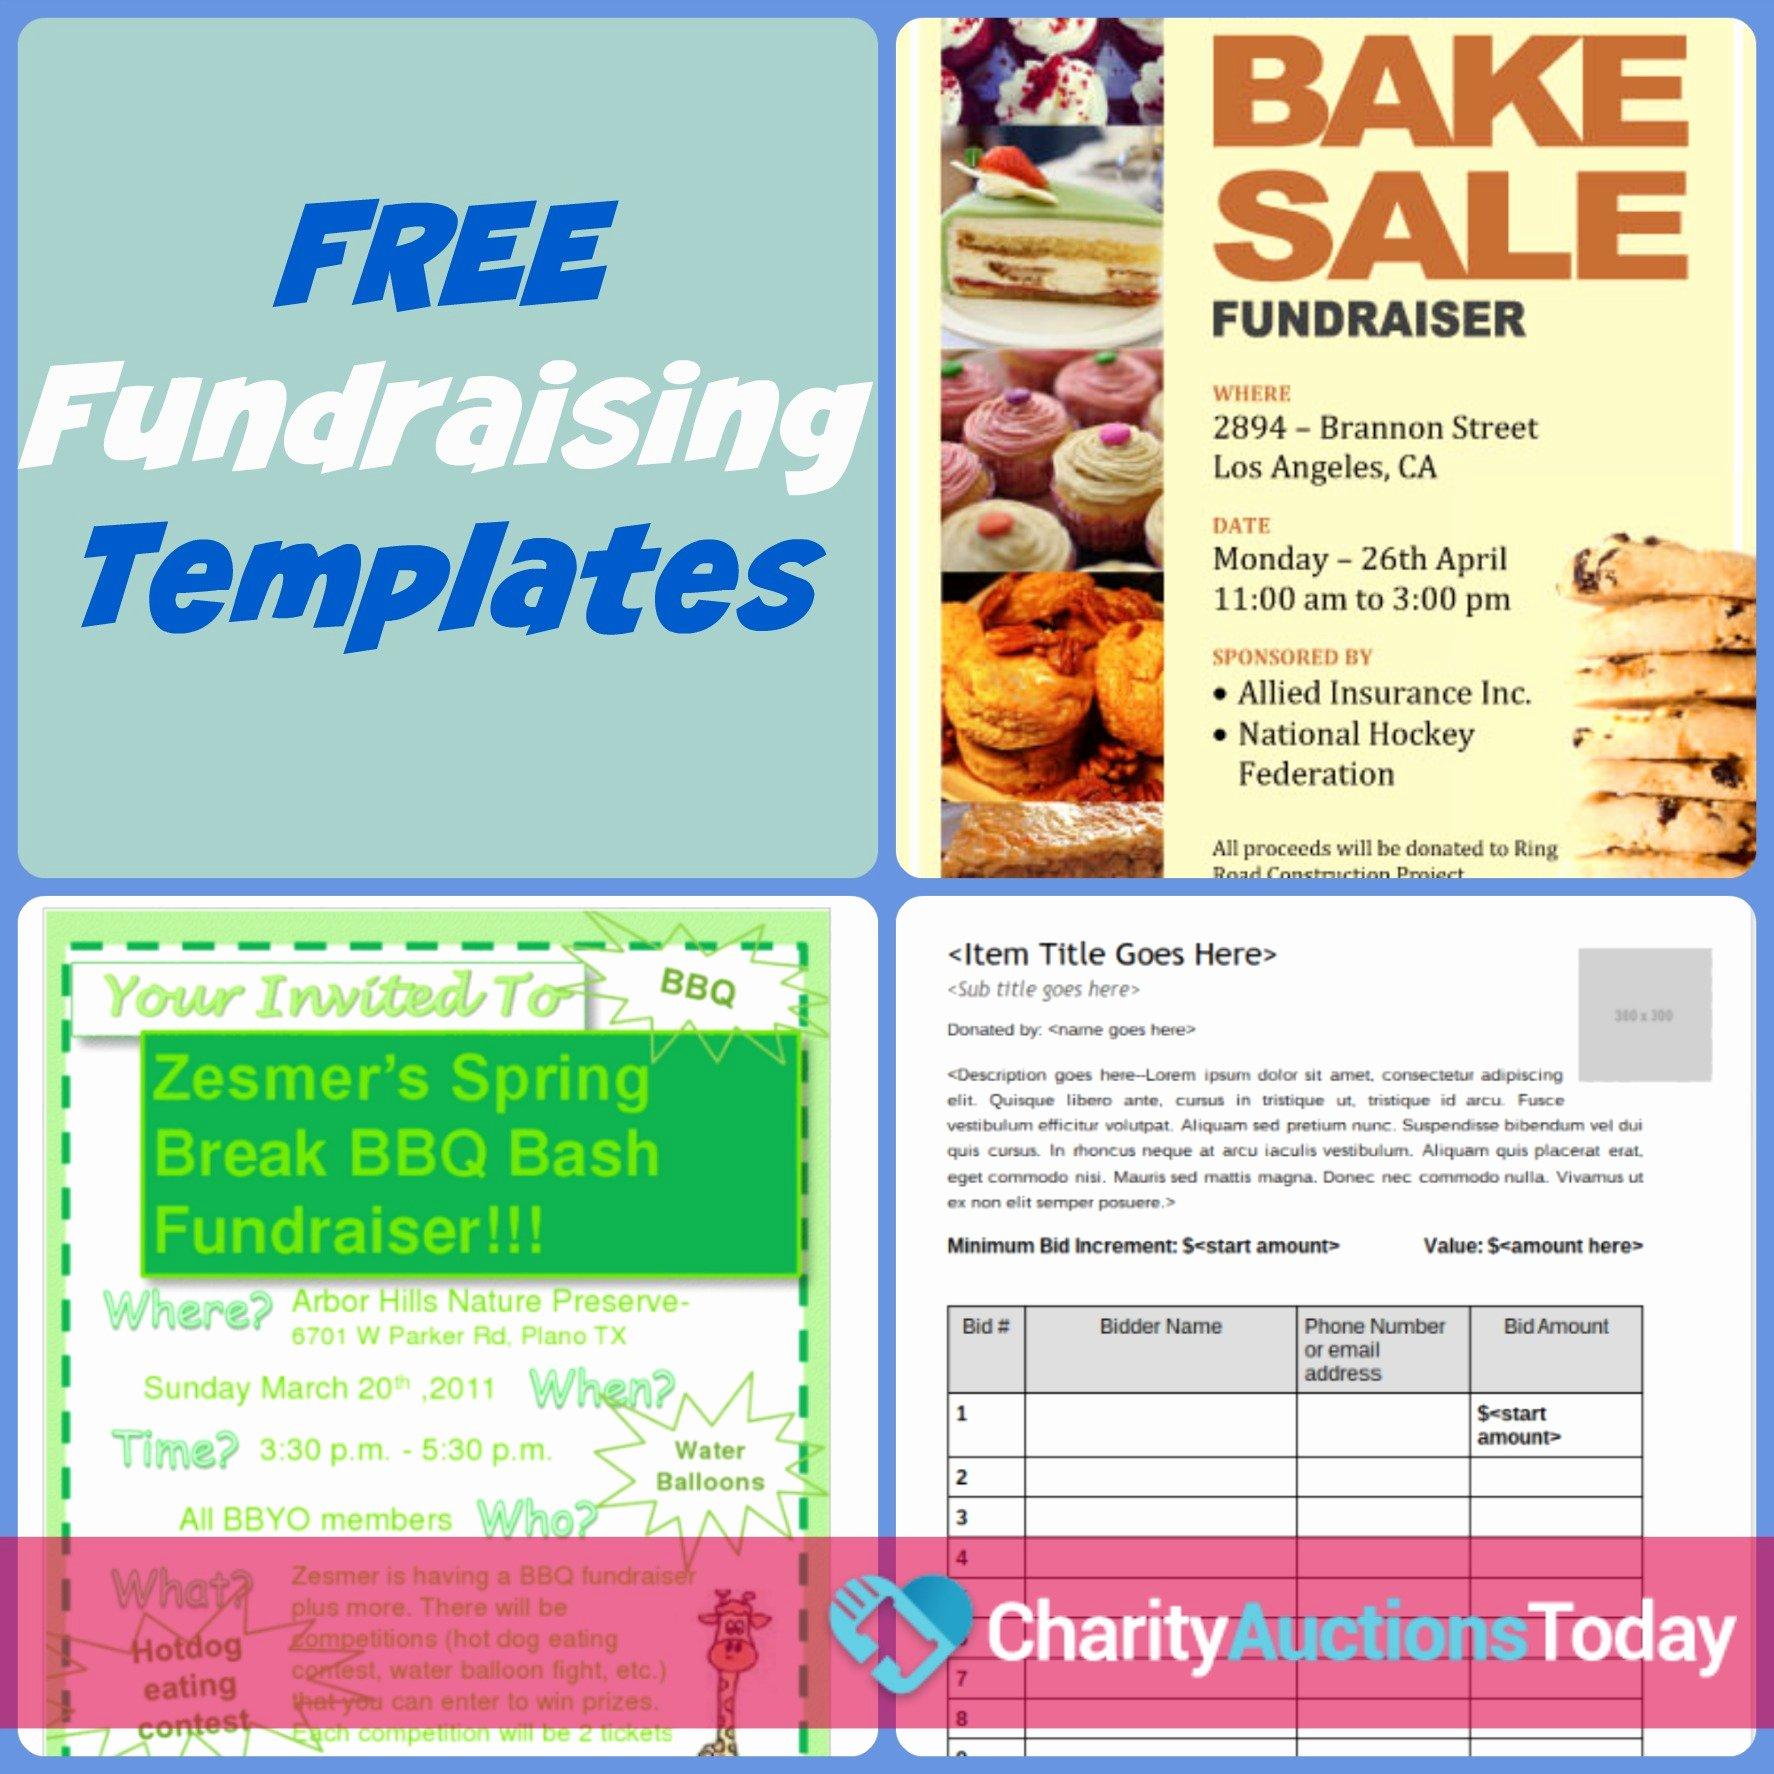 Fundraiser Flyer Template Free Best Of Free Fundraiser Flyer